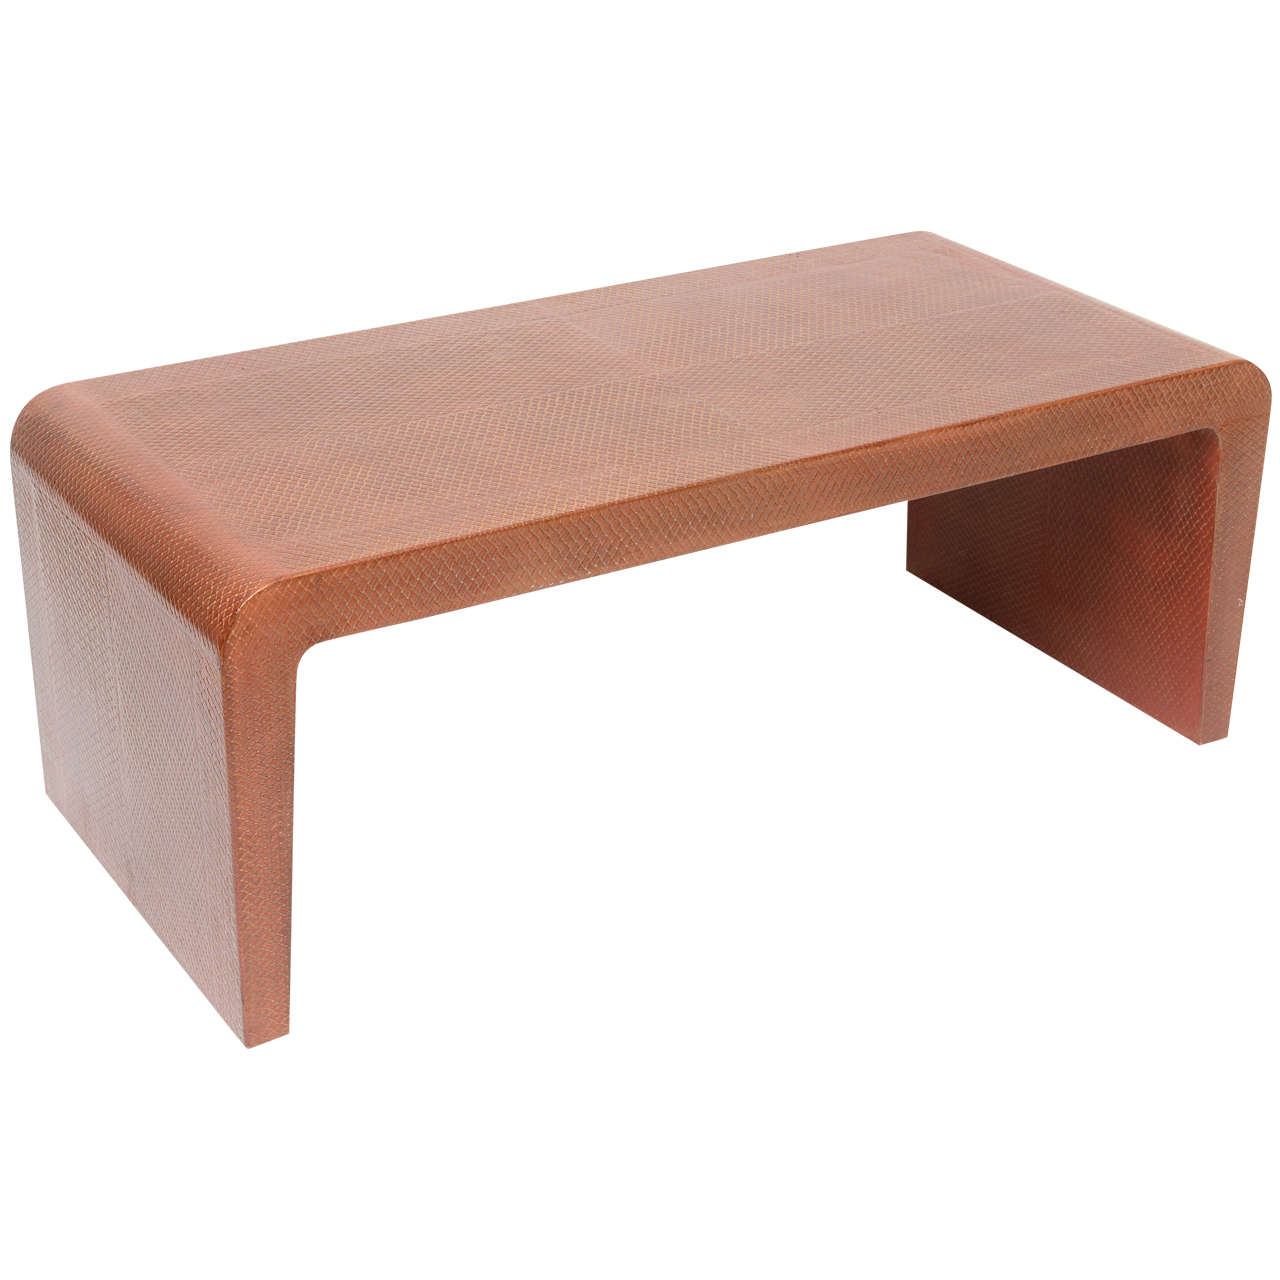 Karl Springer Embossed Leather Table